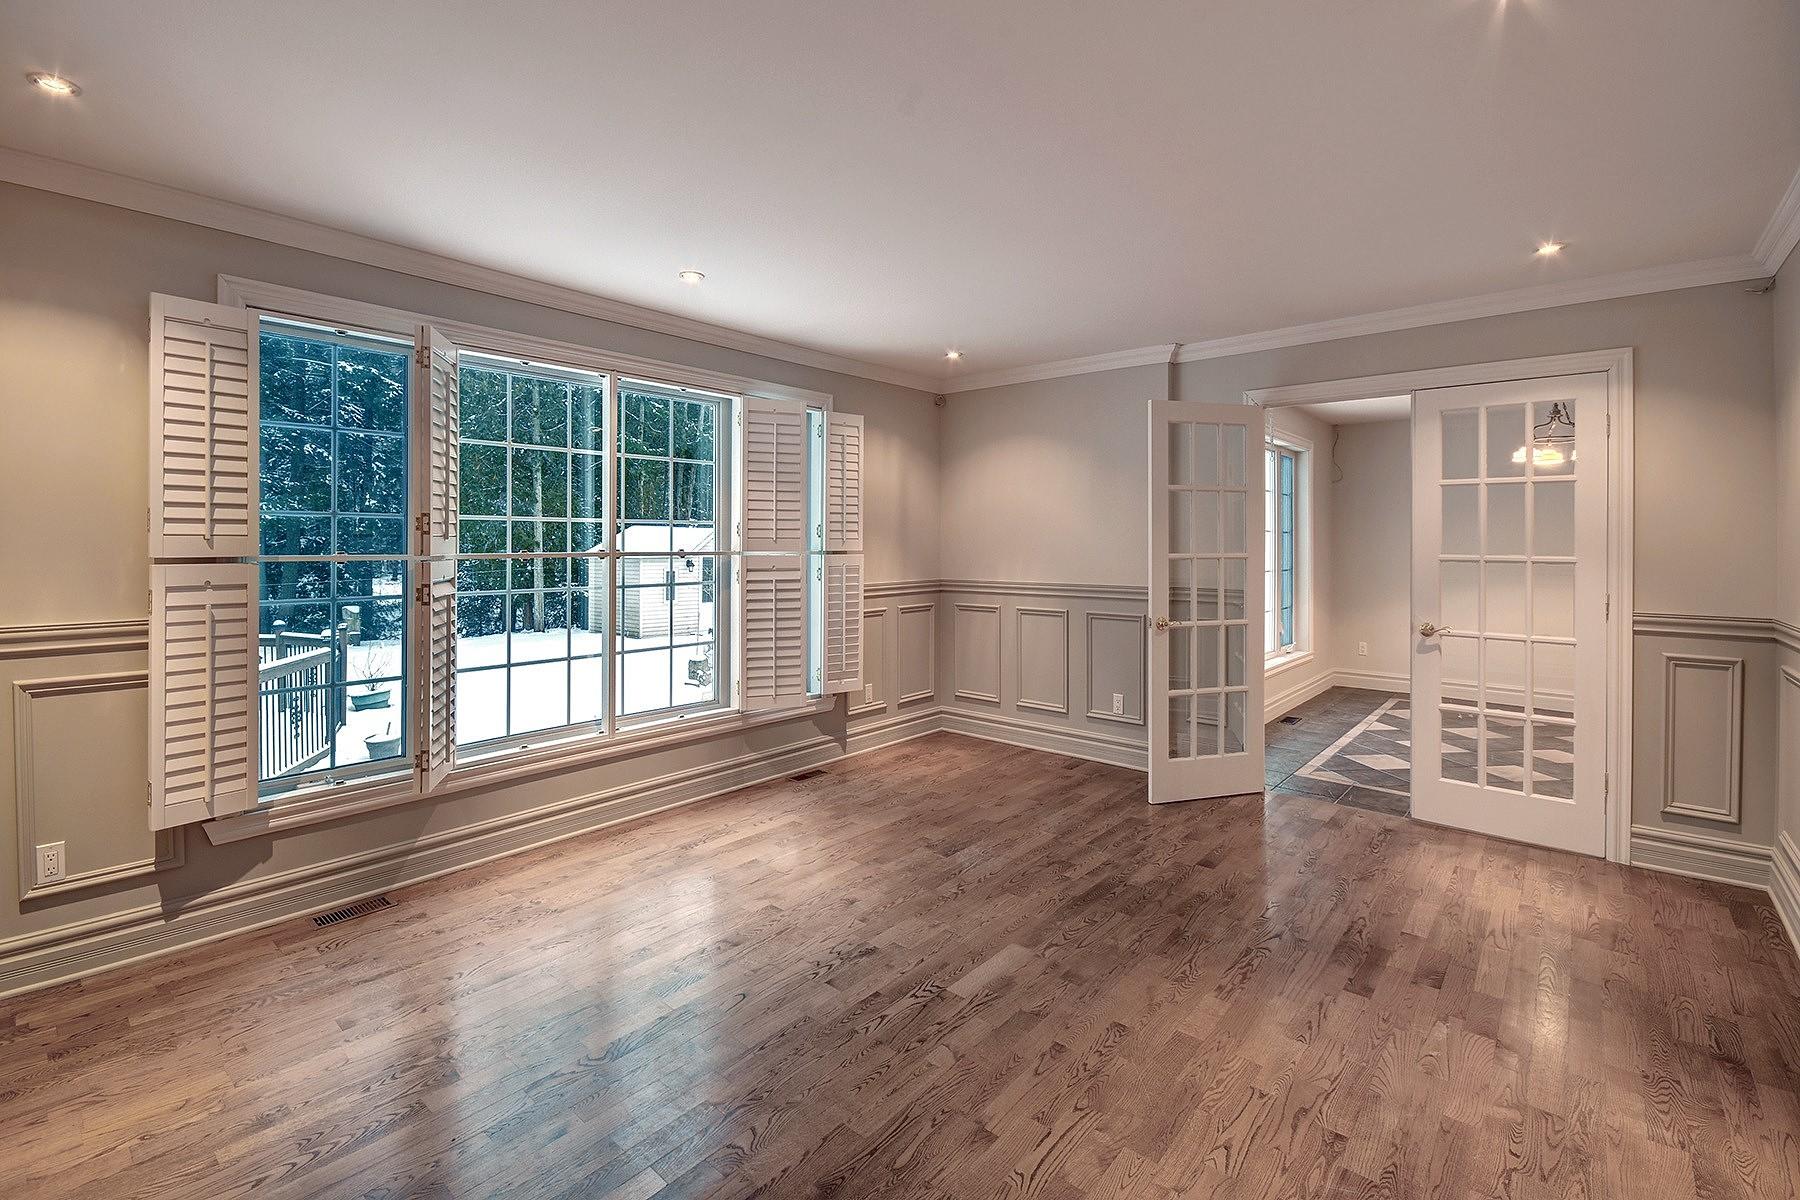 Additional photo for property listing at Blainville, Laurentides 82 Rue des Tournois Blainville, Quebec J7C4Y4 Canada